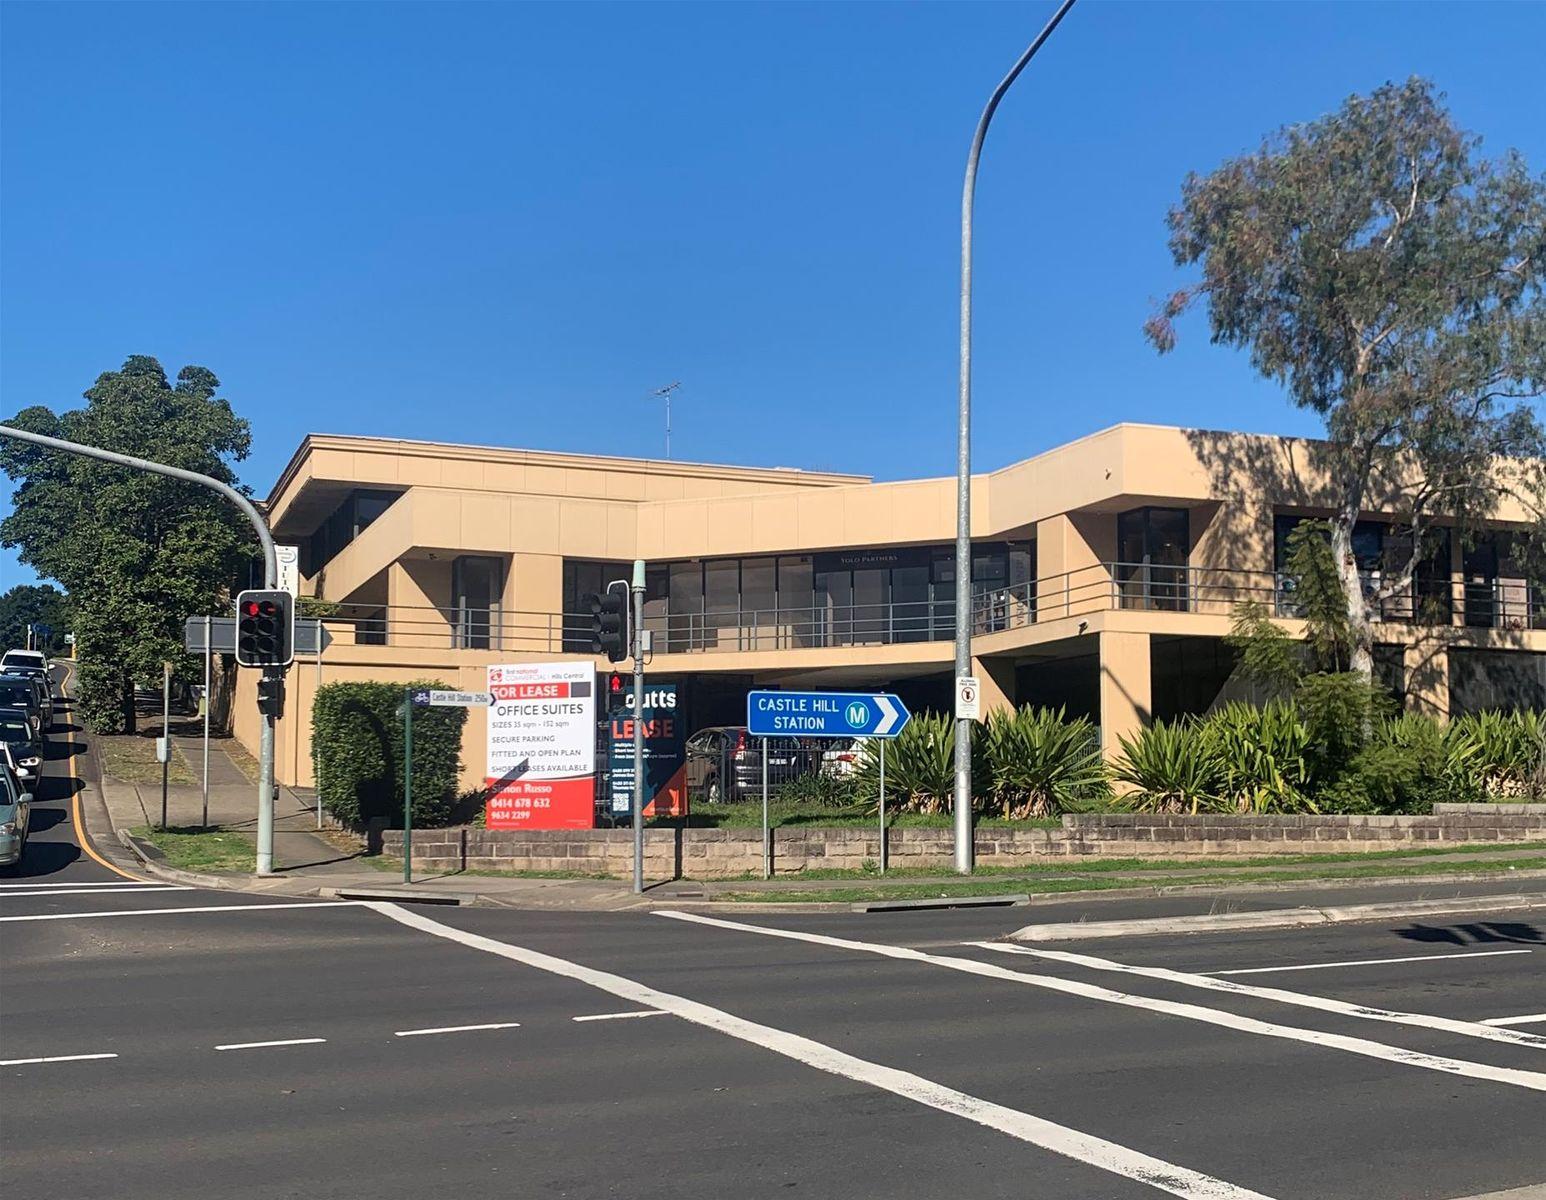 15/10-12 Old Castle Hill Road, Castle Hill, NSW 2154